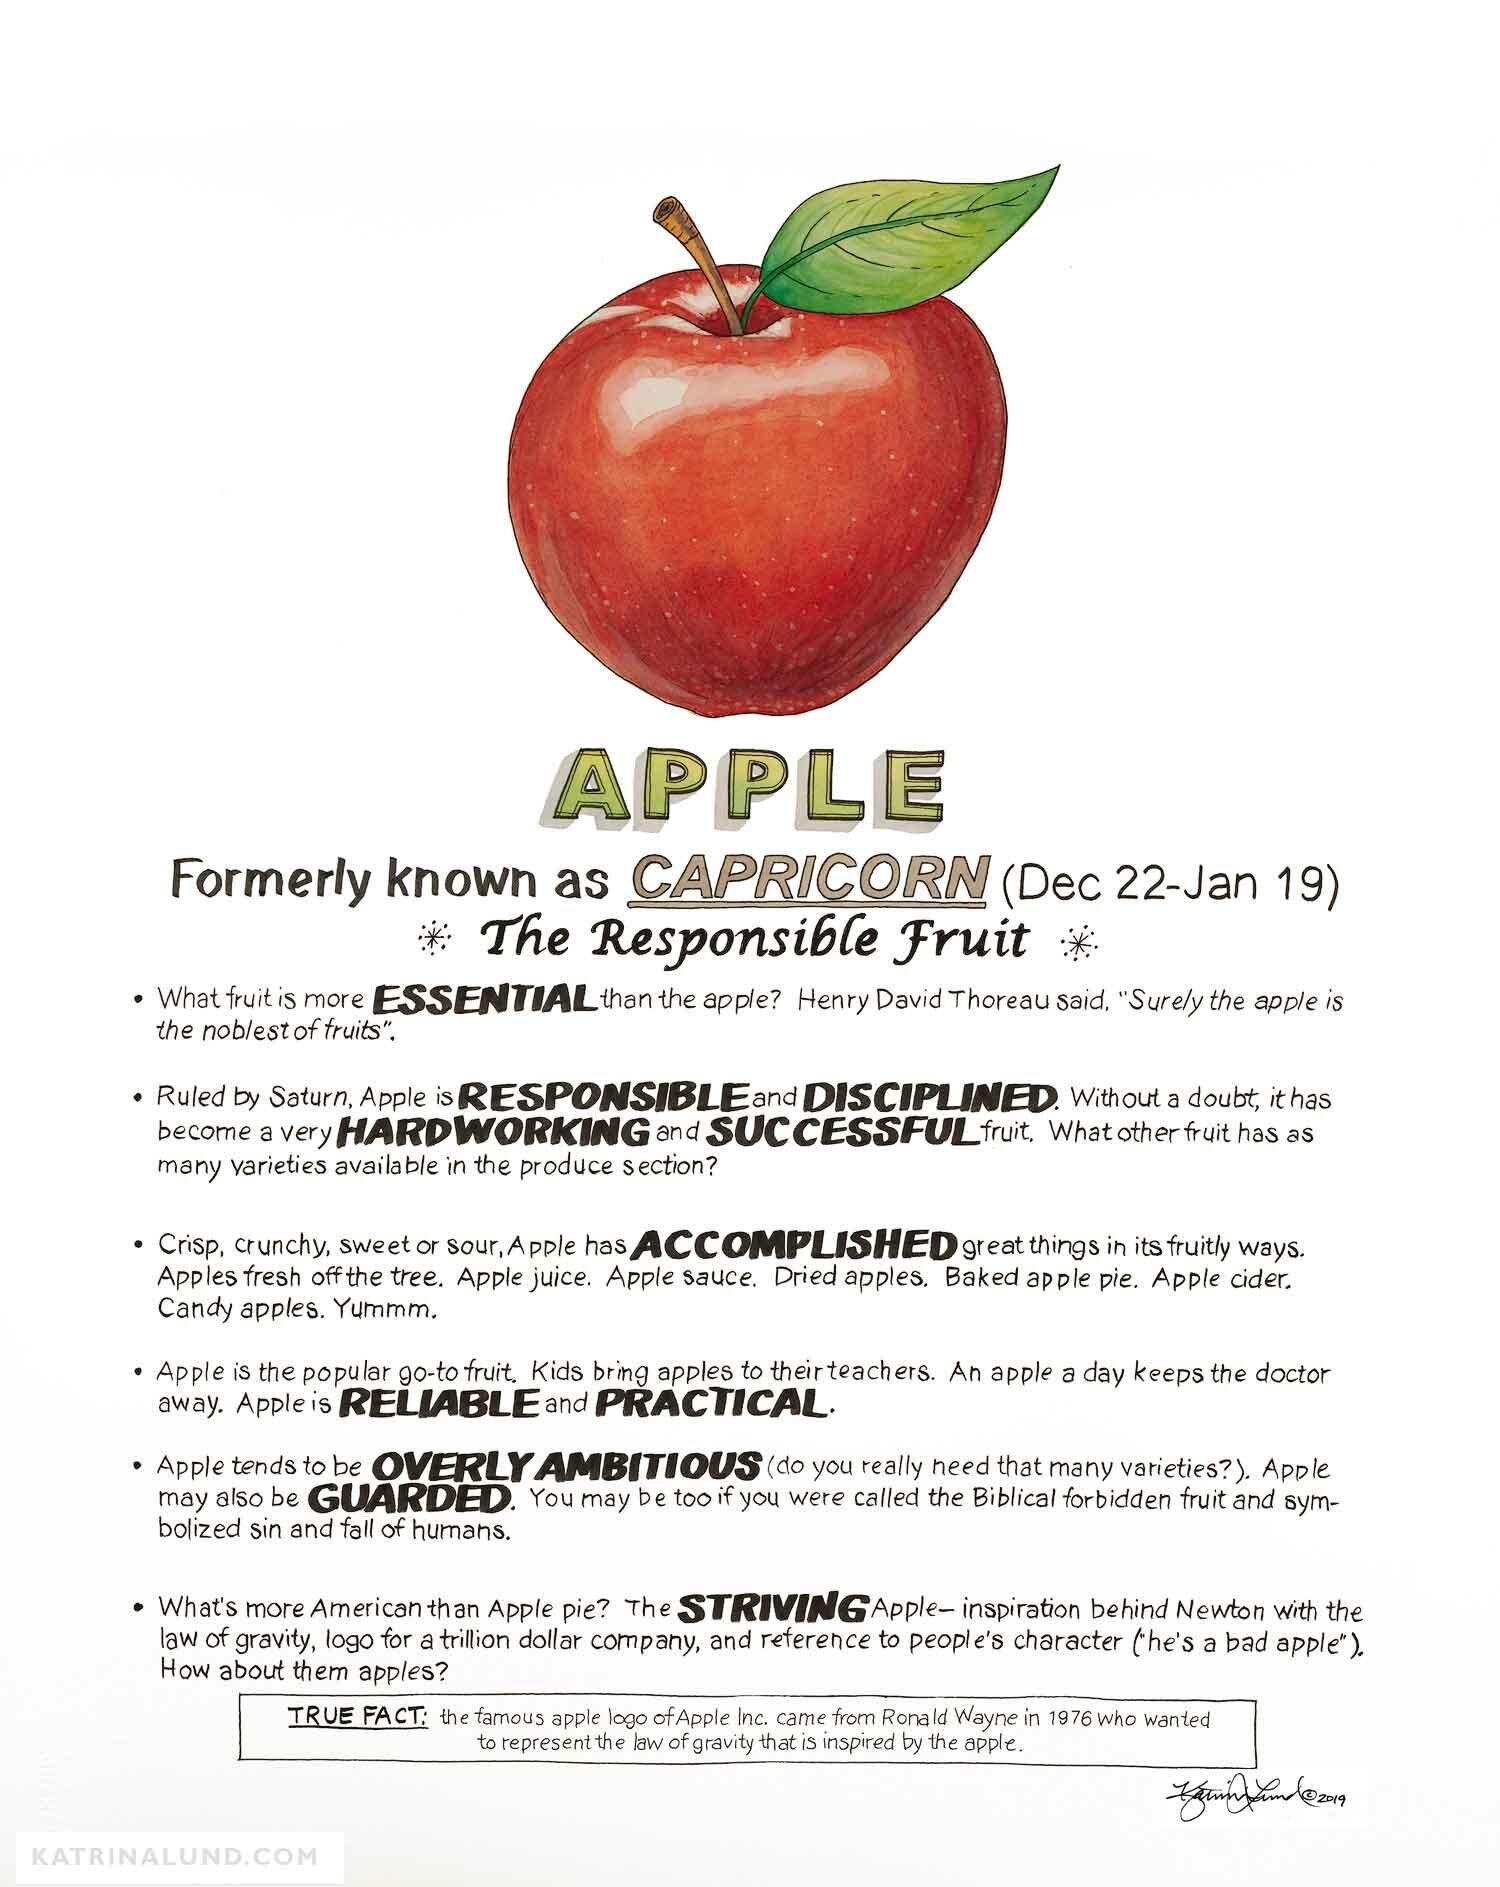 KatrinaLundArt_FruitAstrology_Apple_web.jpg